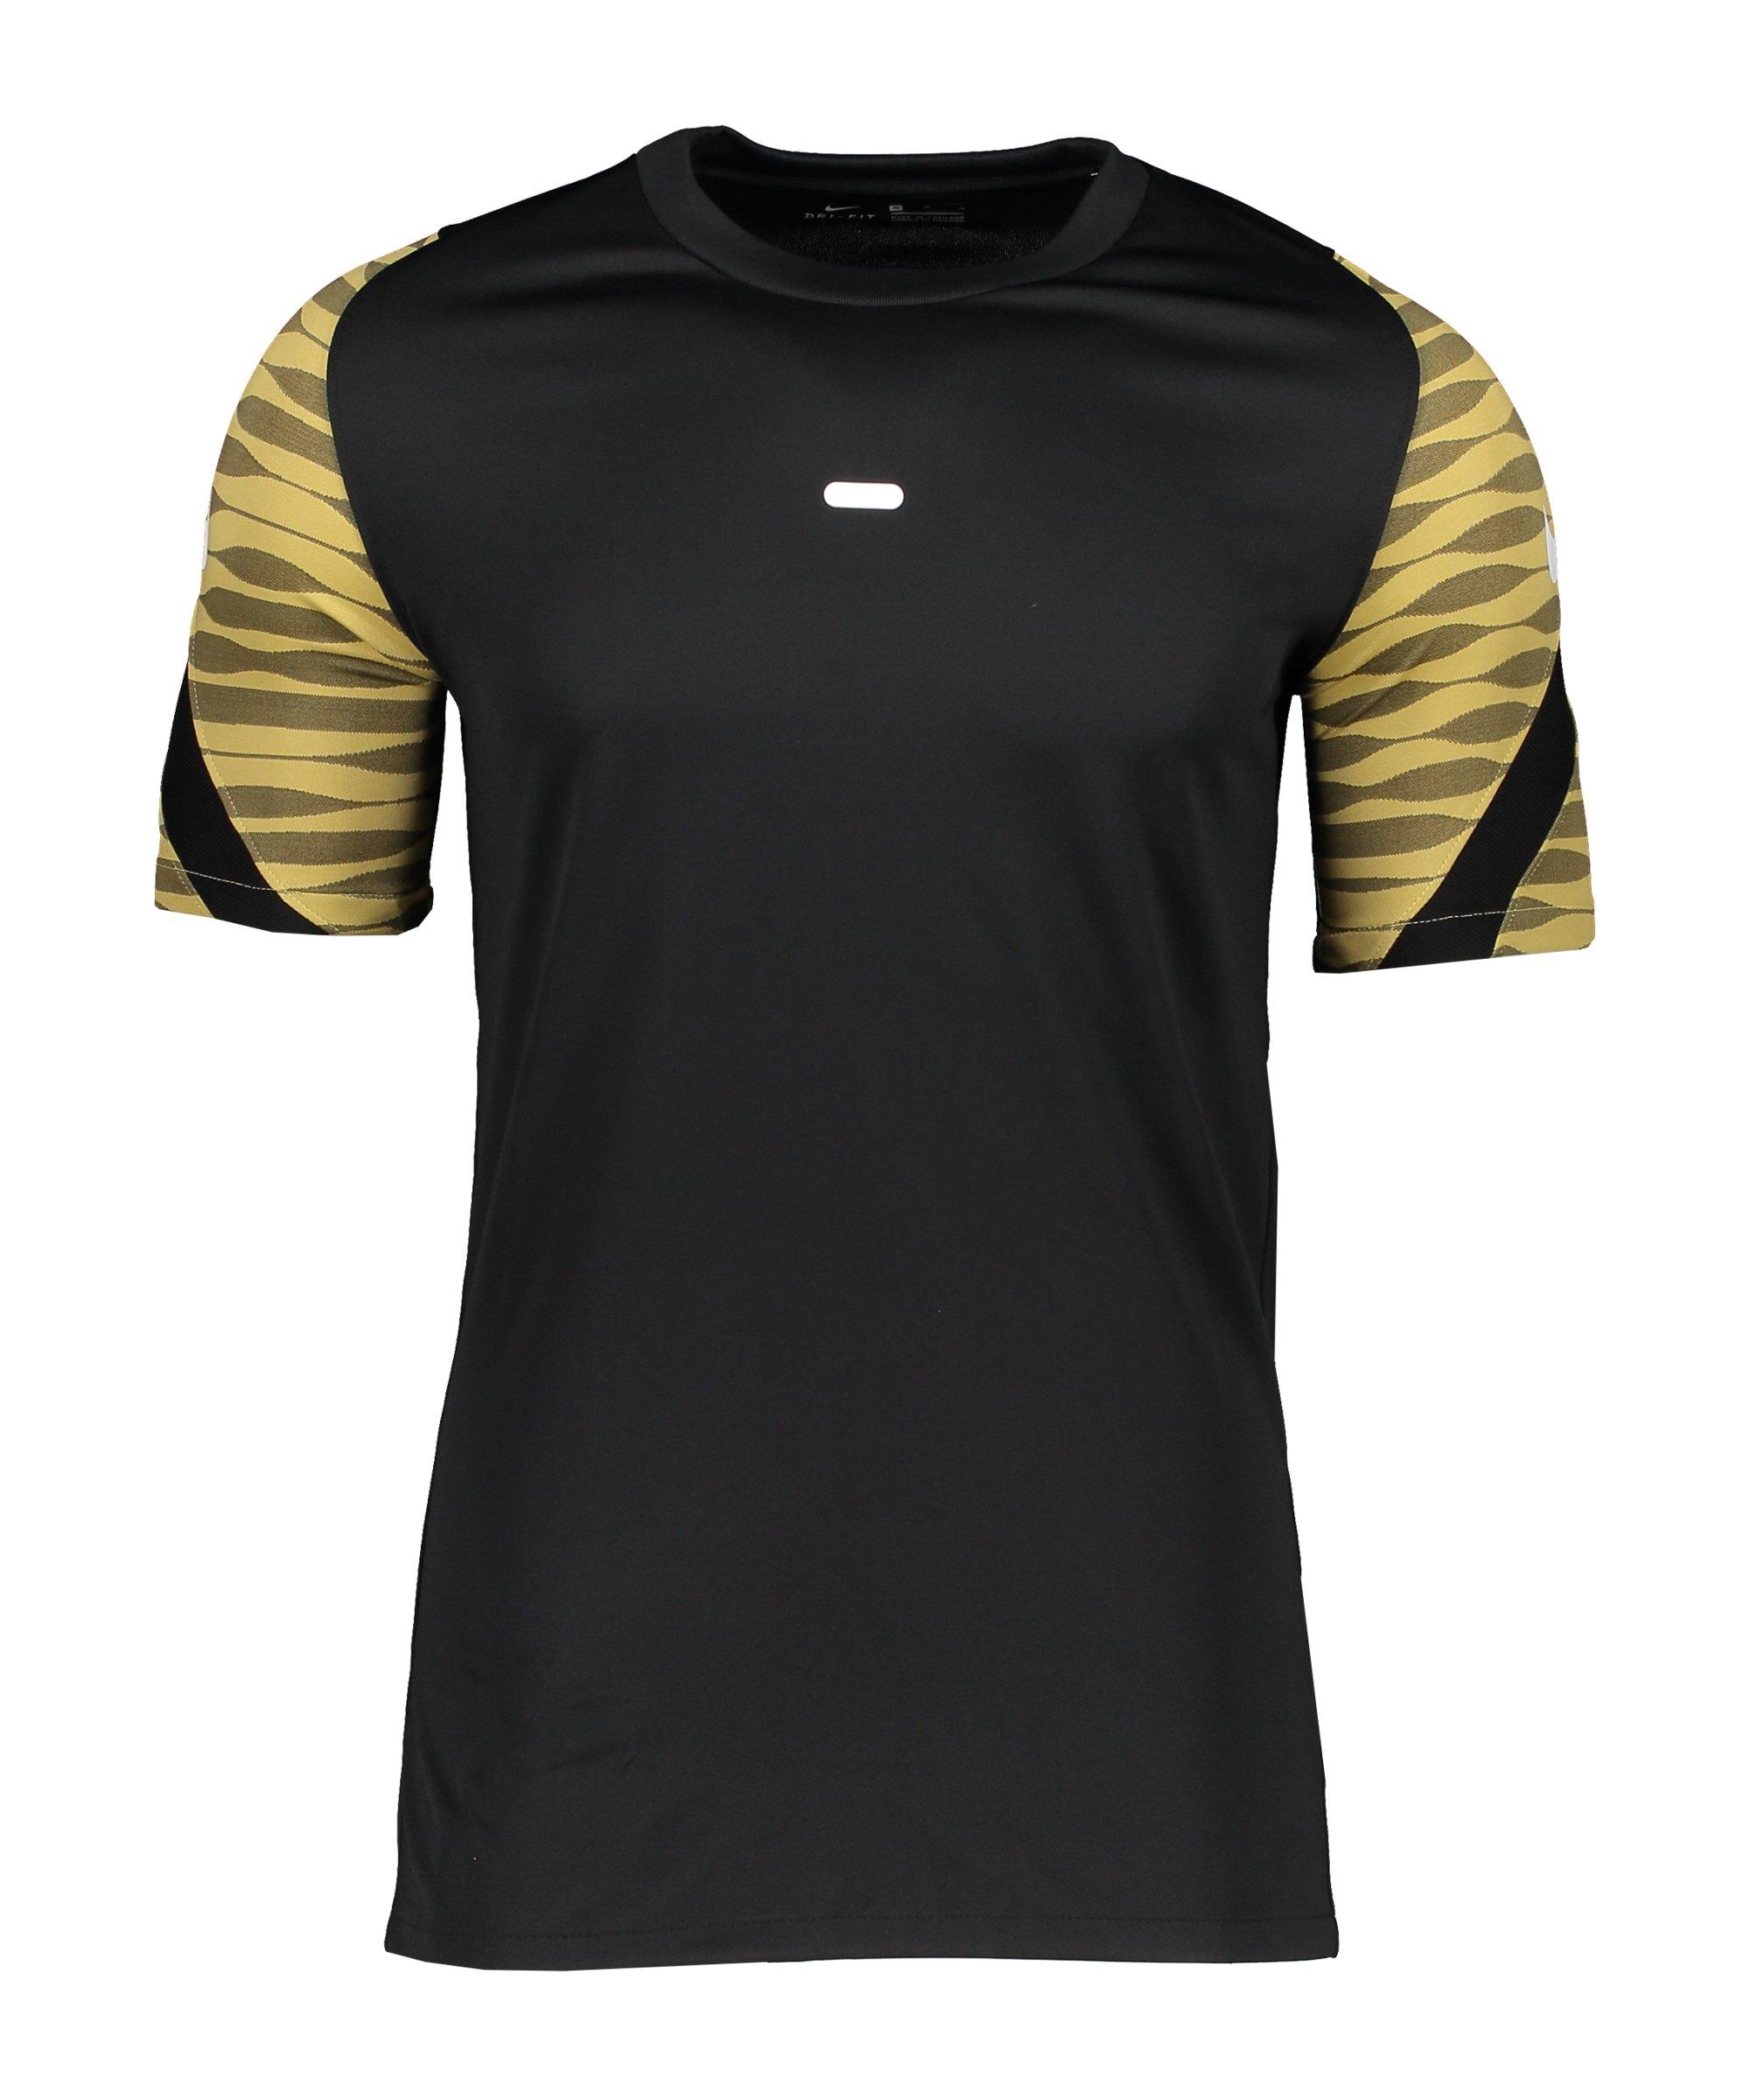 Nike Strike 21 T-Shirt Schwarz Gold F011 - schwarz